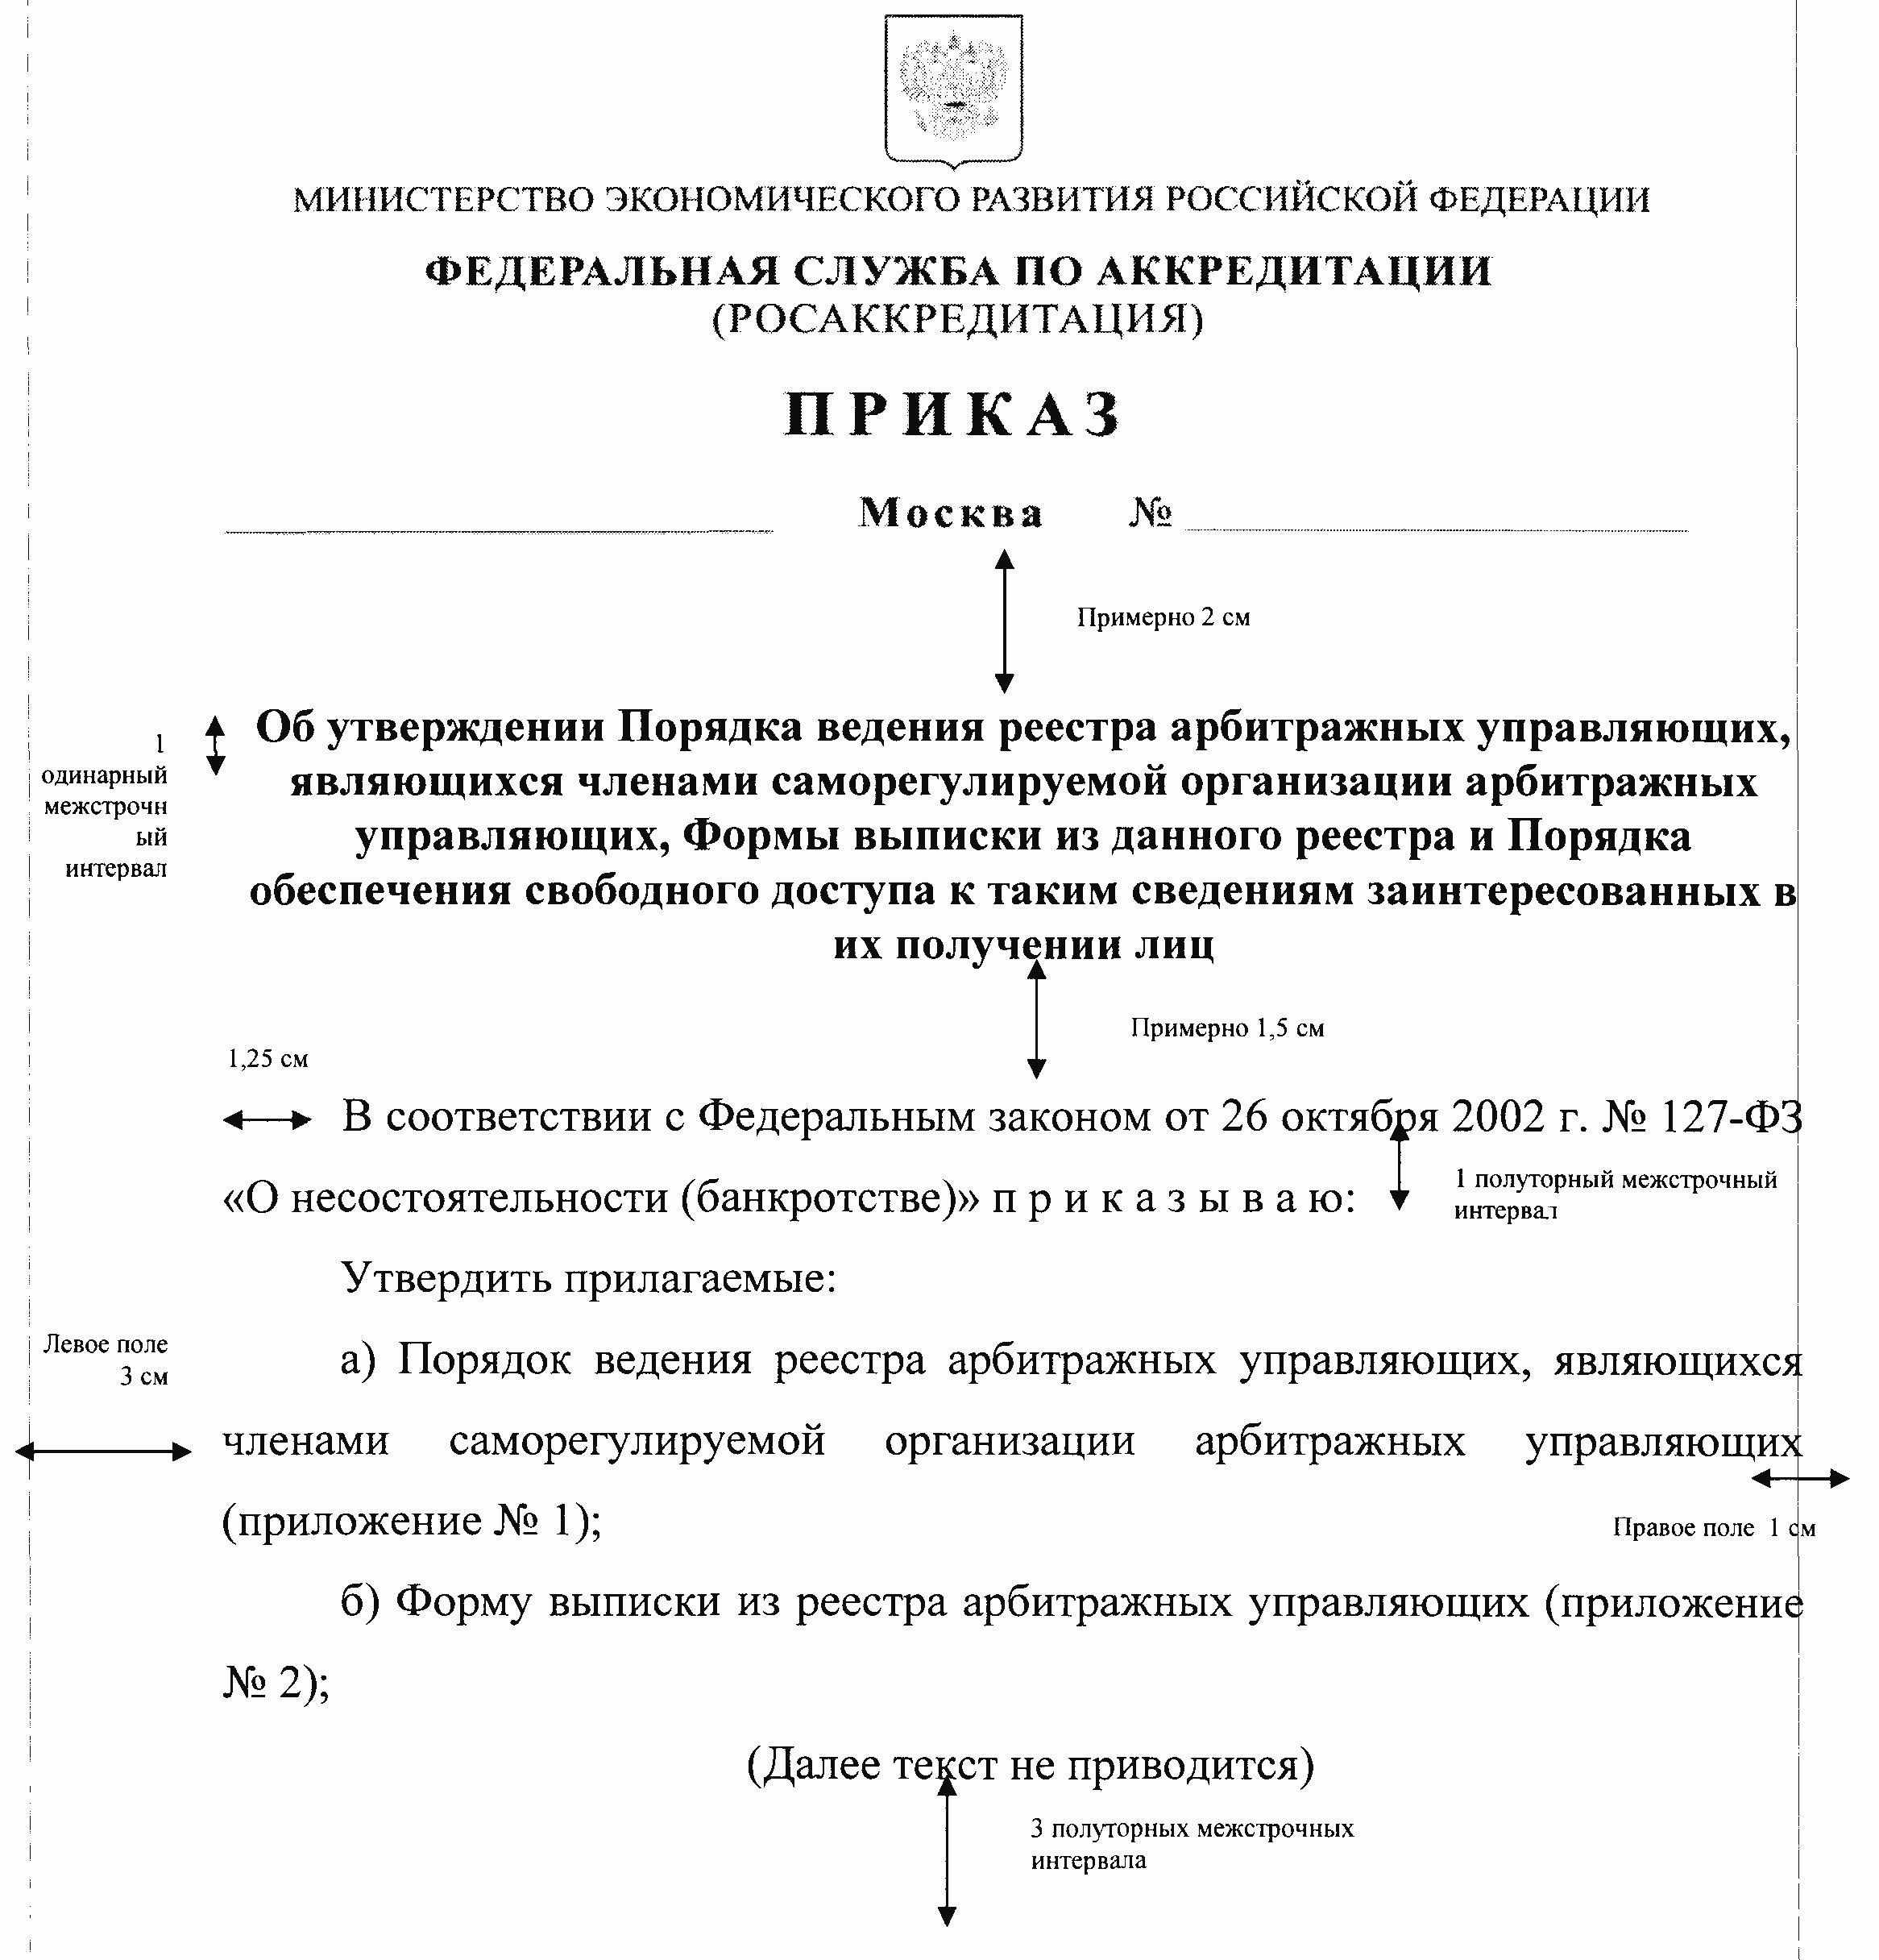 Образец приказа на сбор макулатуры расчета себестоимости макулатуры